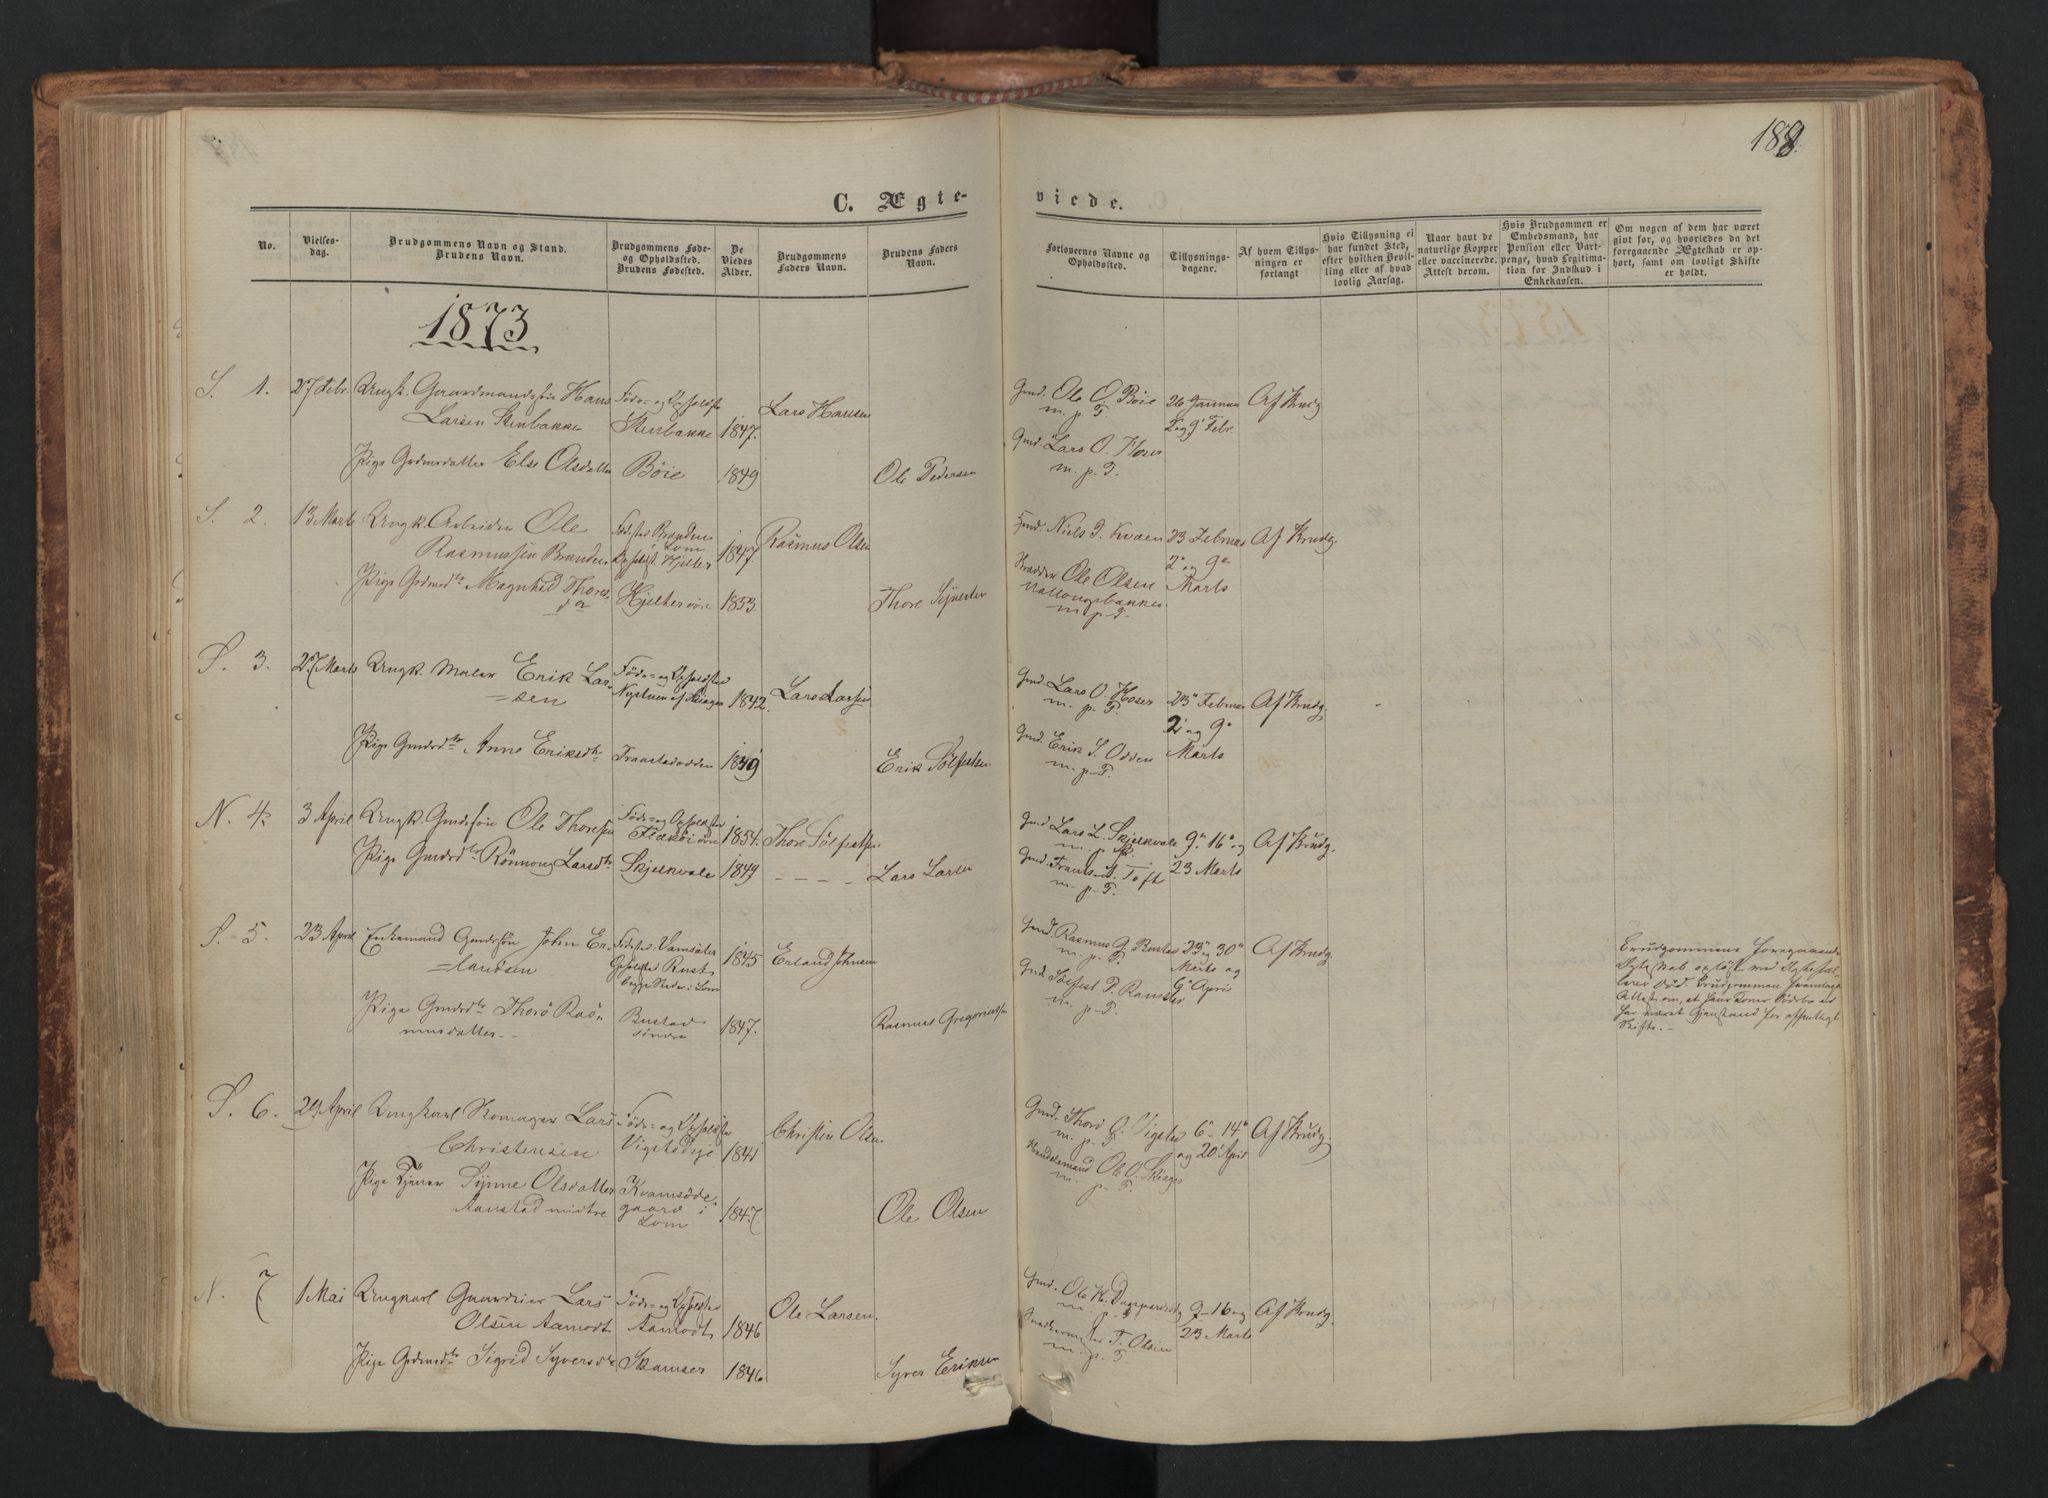 SAH, Skjåk prestekontor, Ministerialbok nr. 1, 1863-1879, s. 188